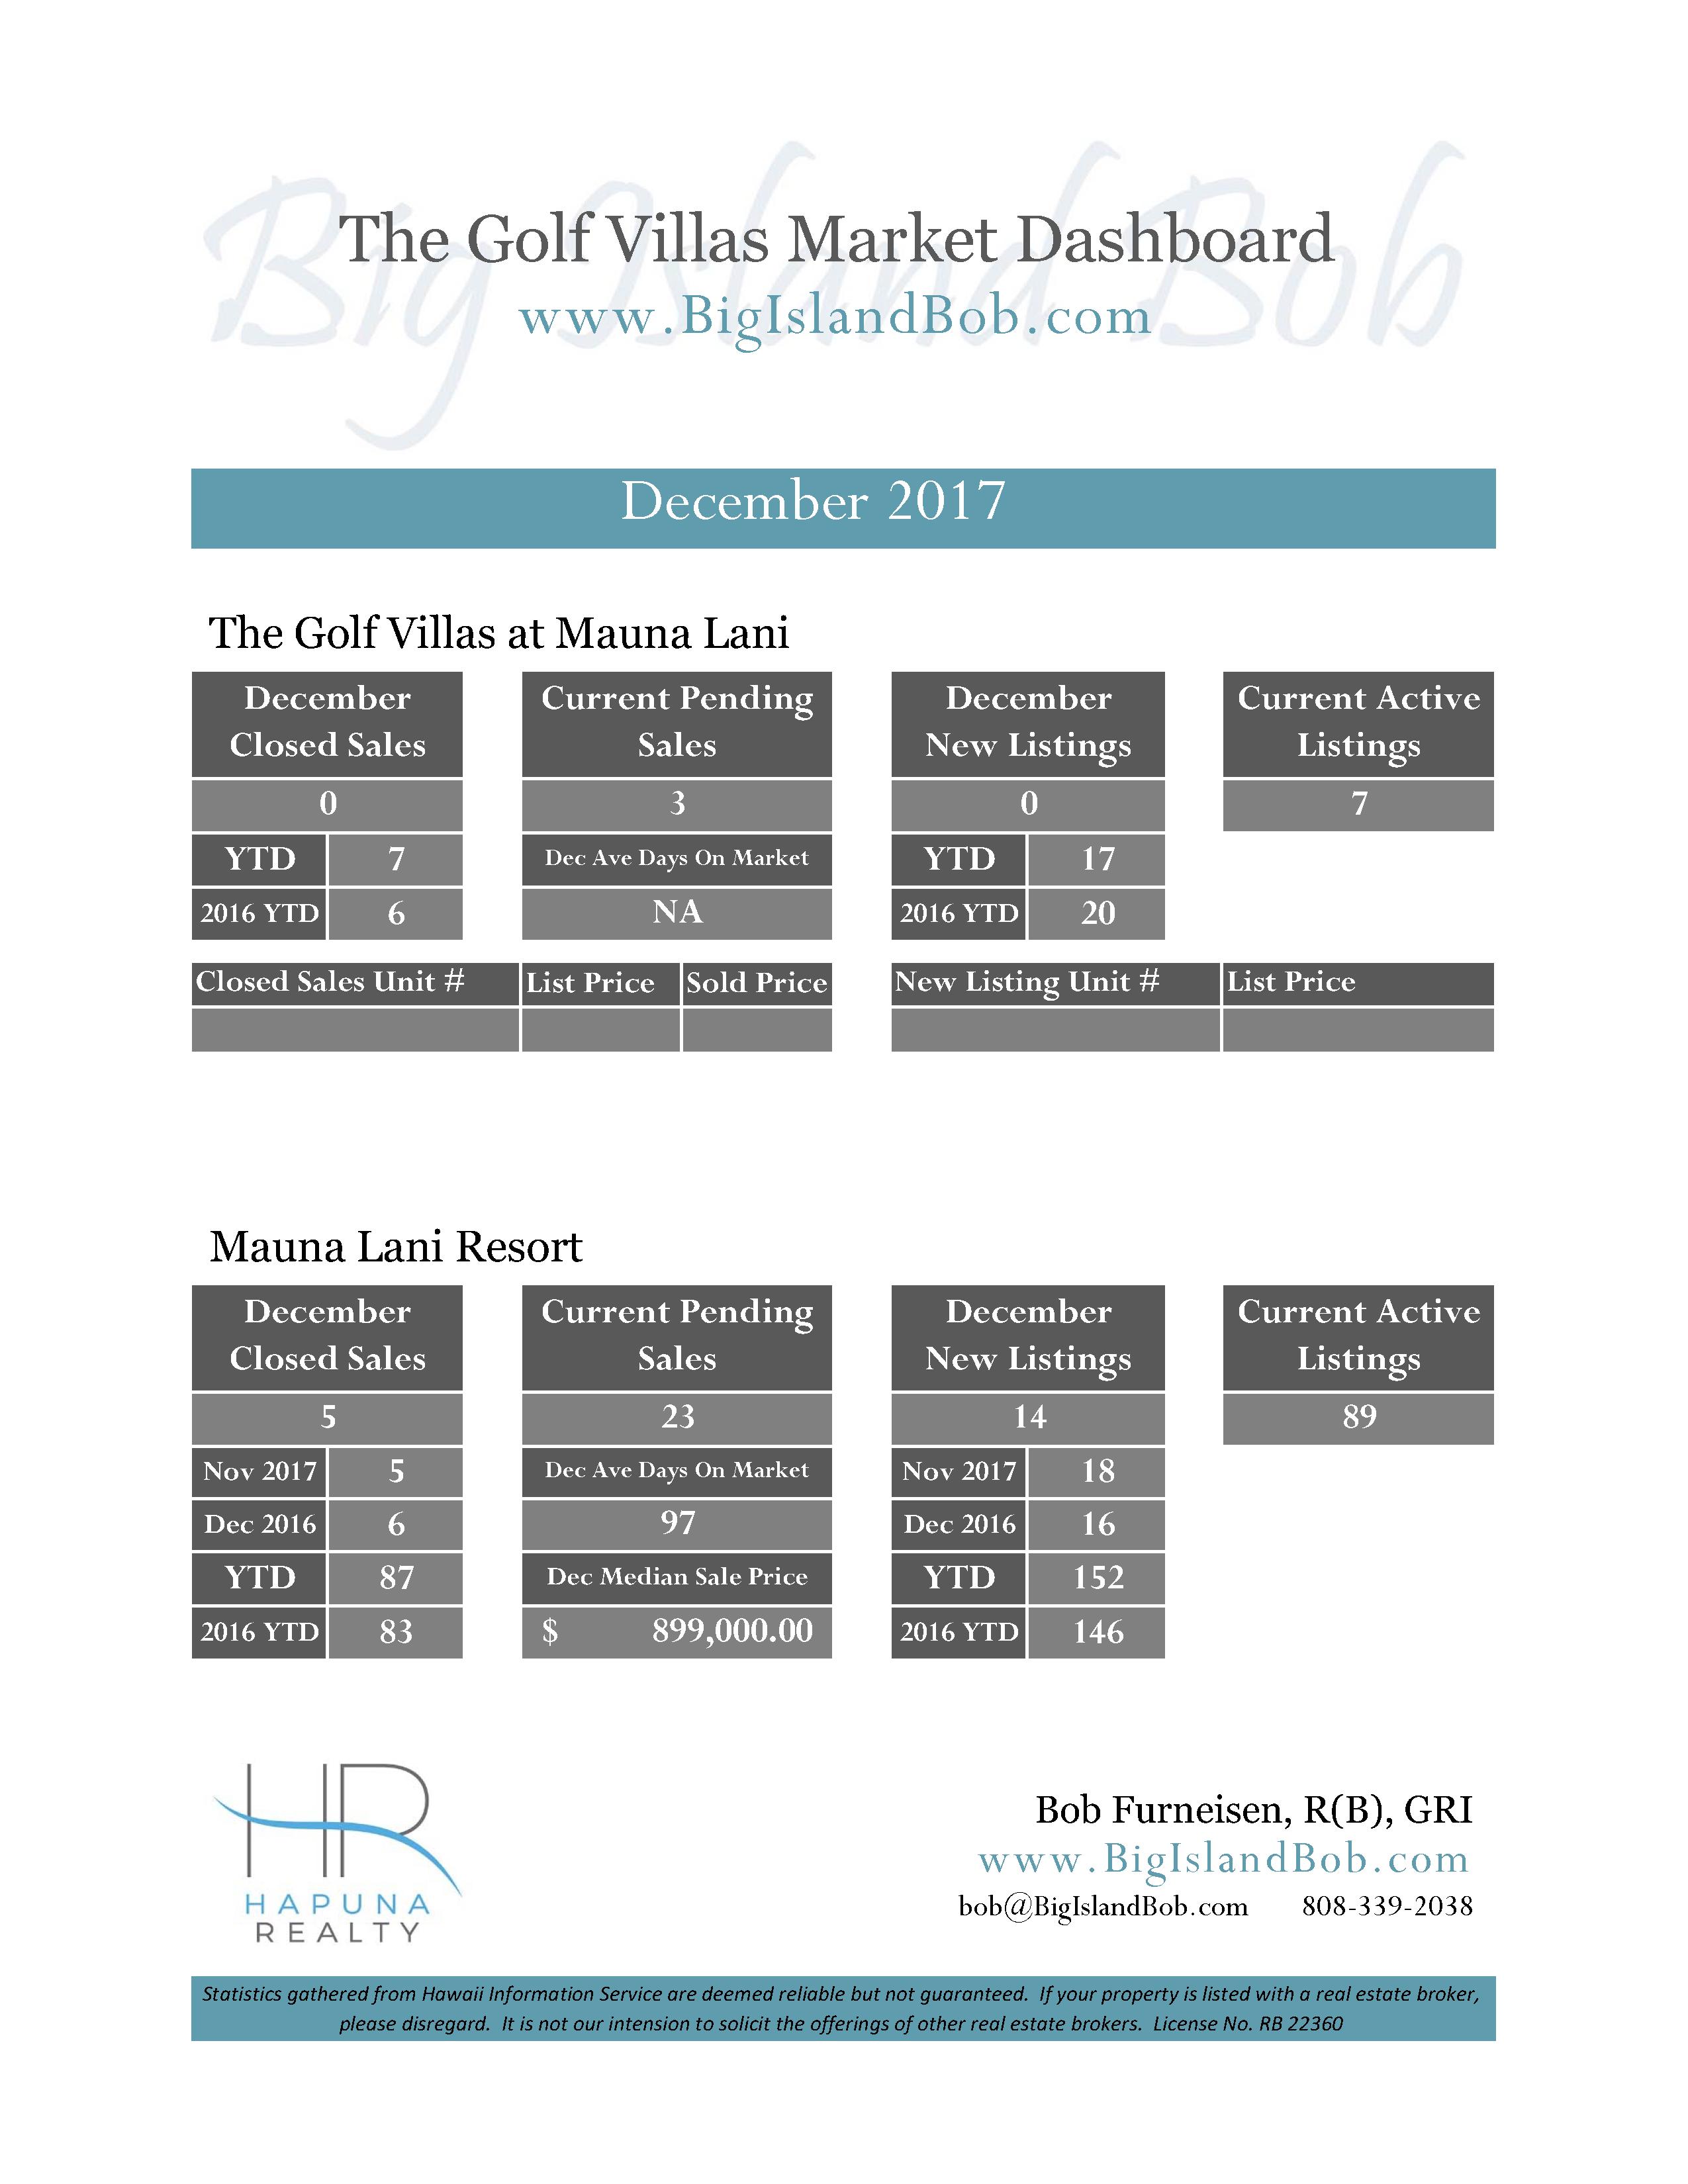 Golf Villas at Mauna Lani December 2017 Real Estate Market Dashboard